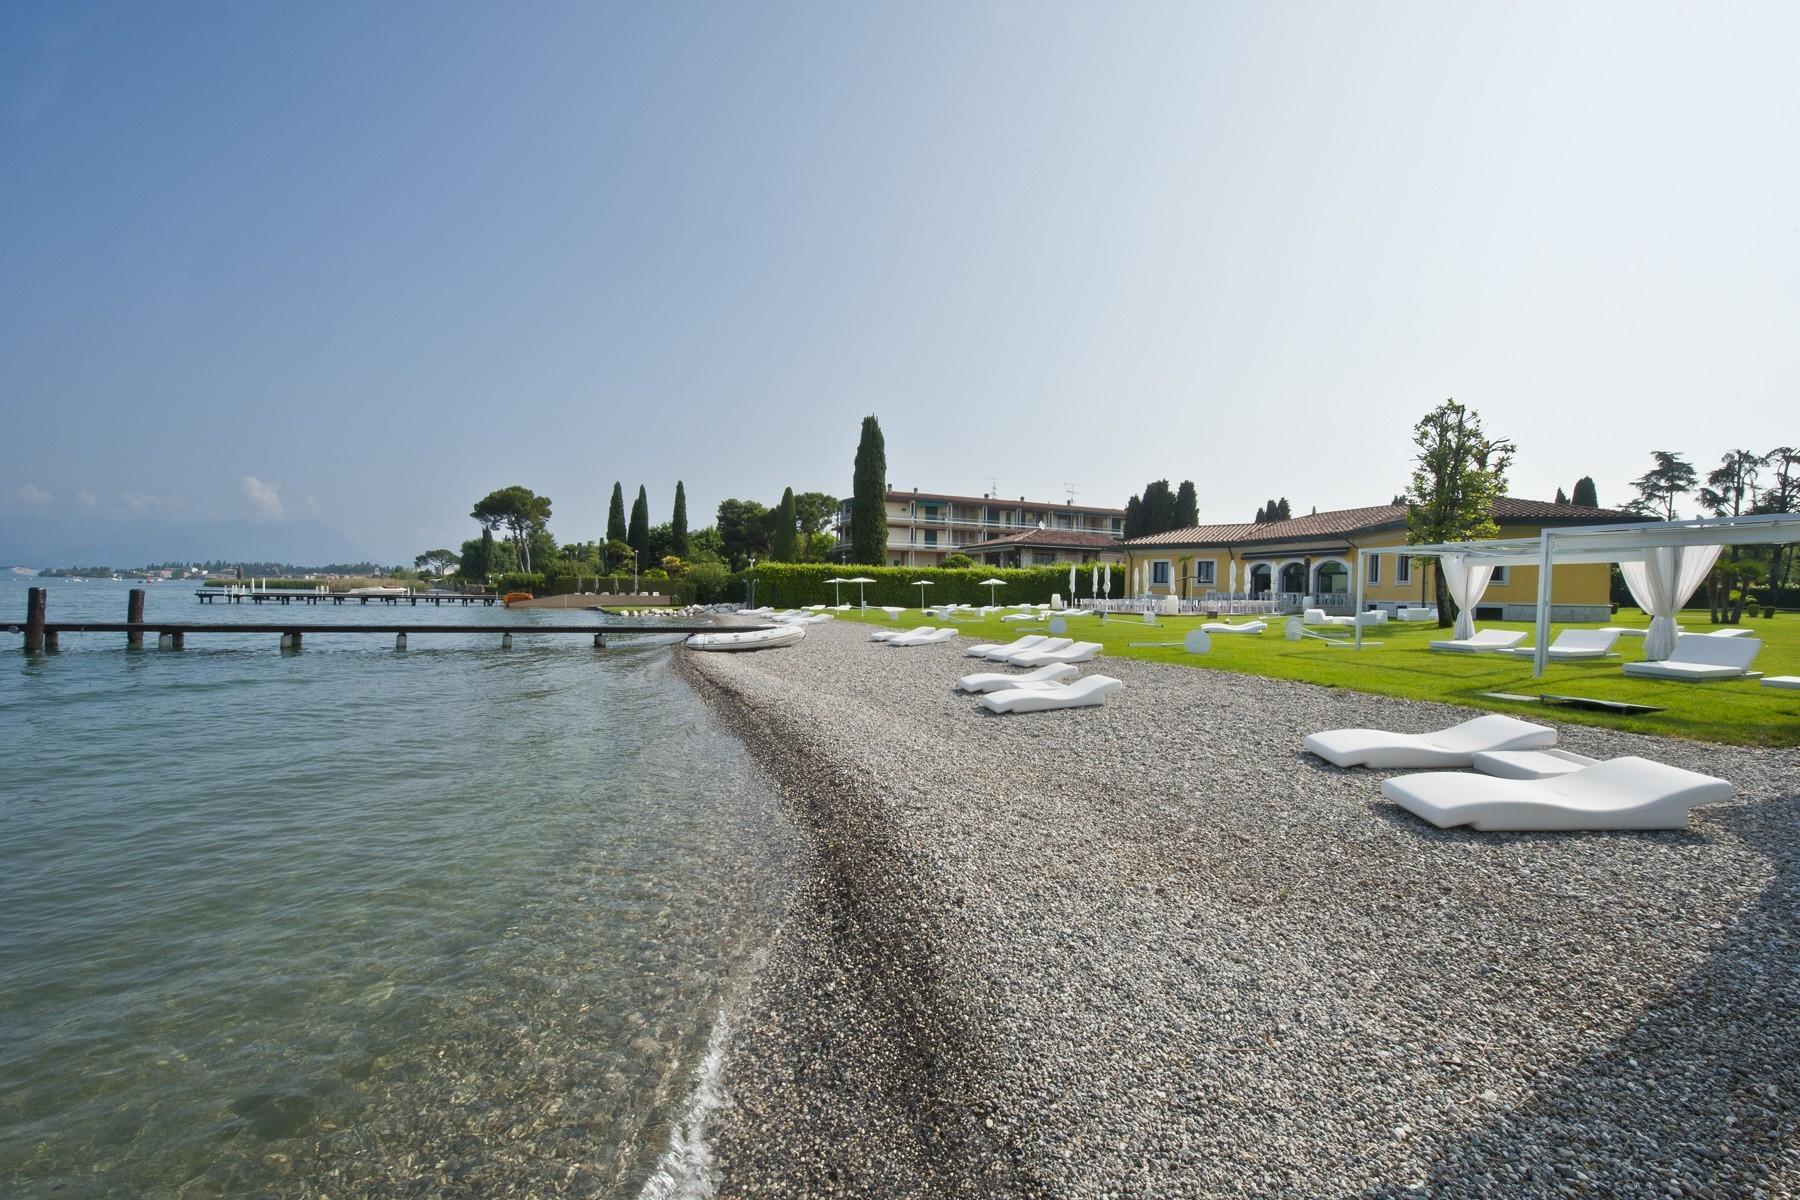 Villa in Vendita a Sirmione: 5 locali, 550 mq - Foto 12